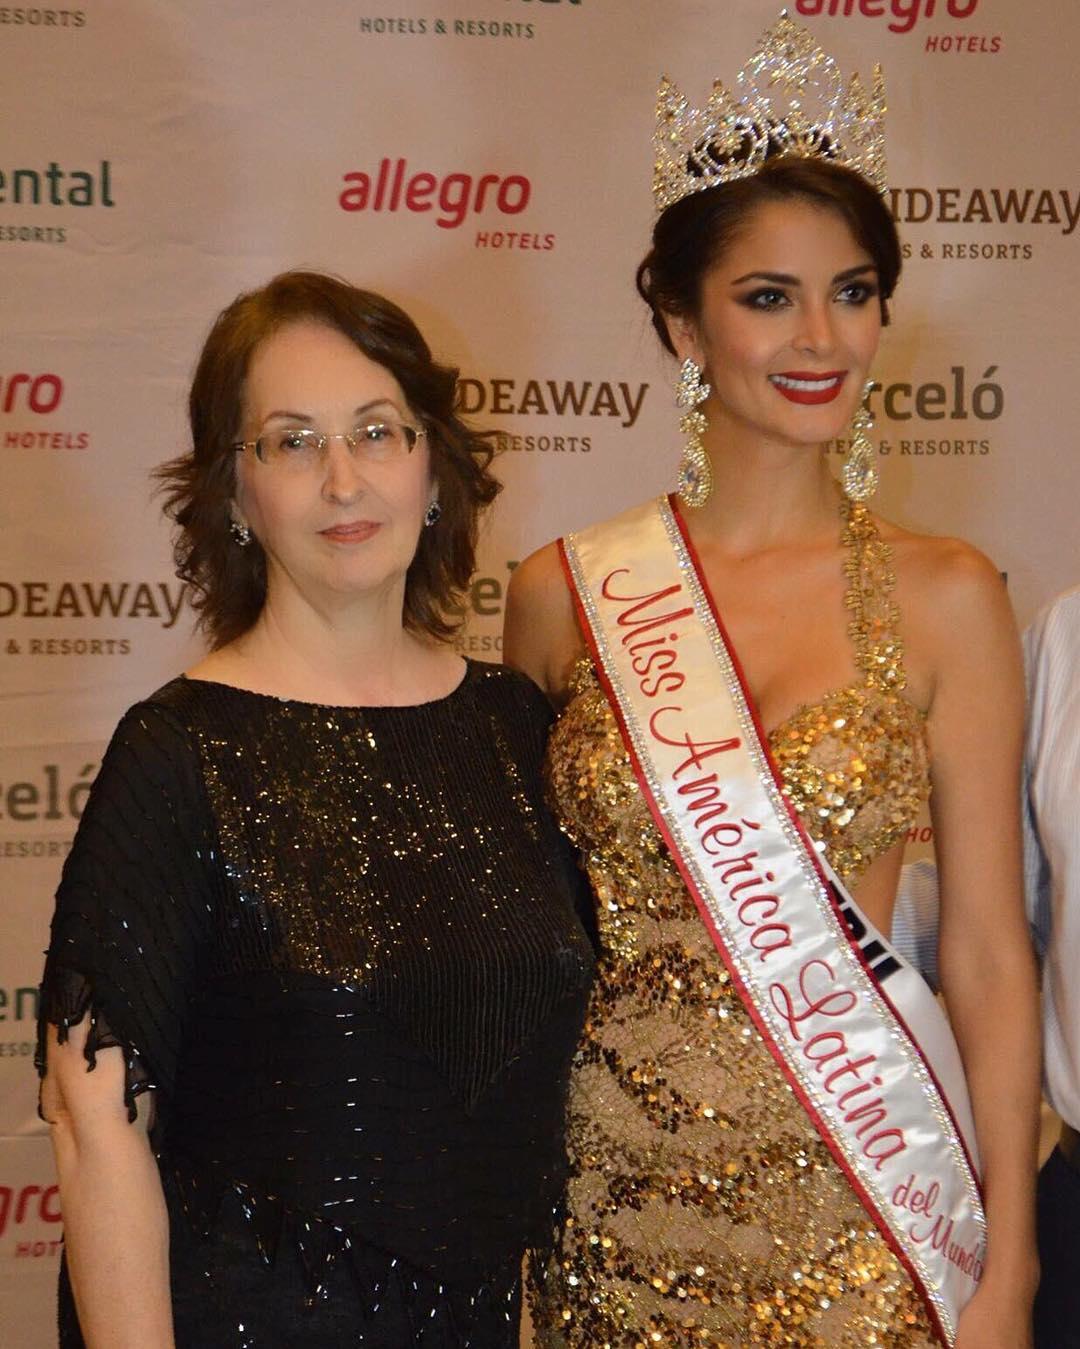 laura spoya, miss america latina mundo 2016. Etepcir5